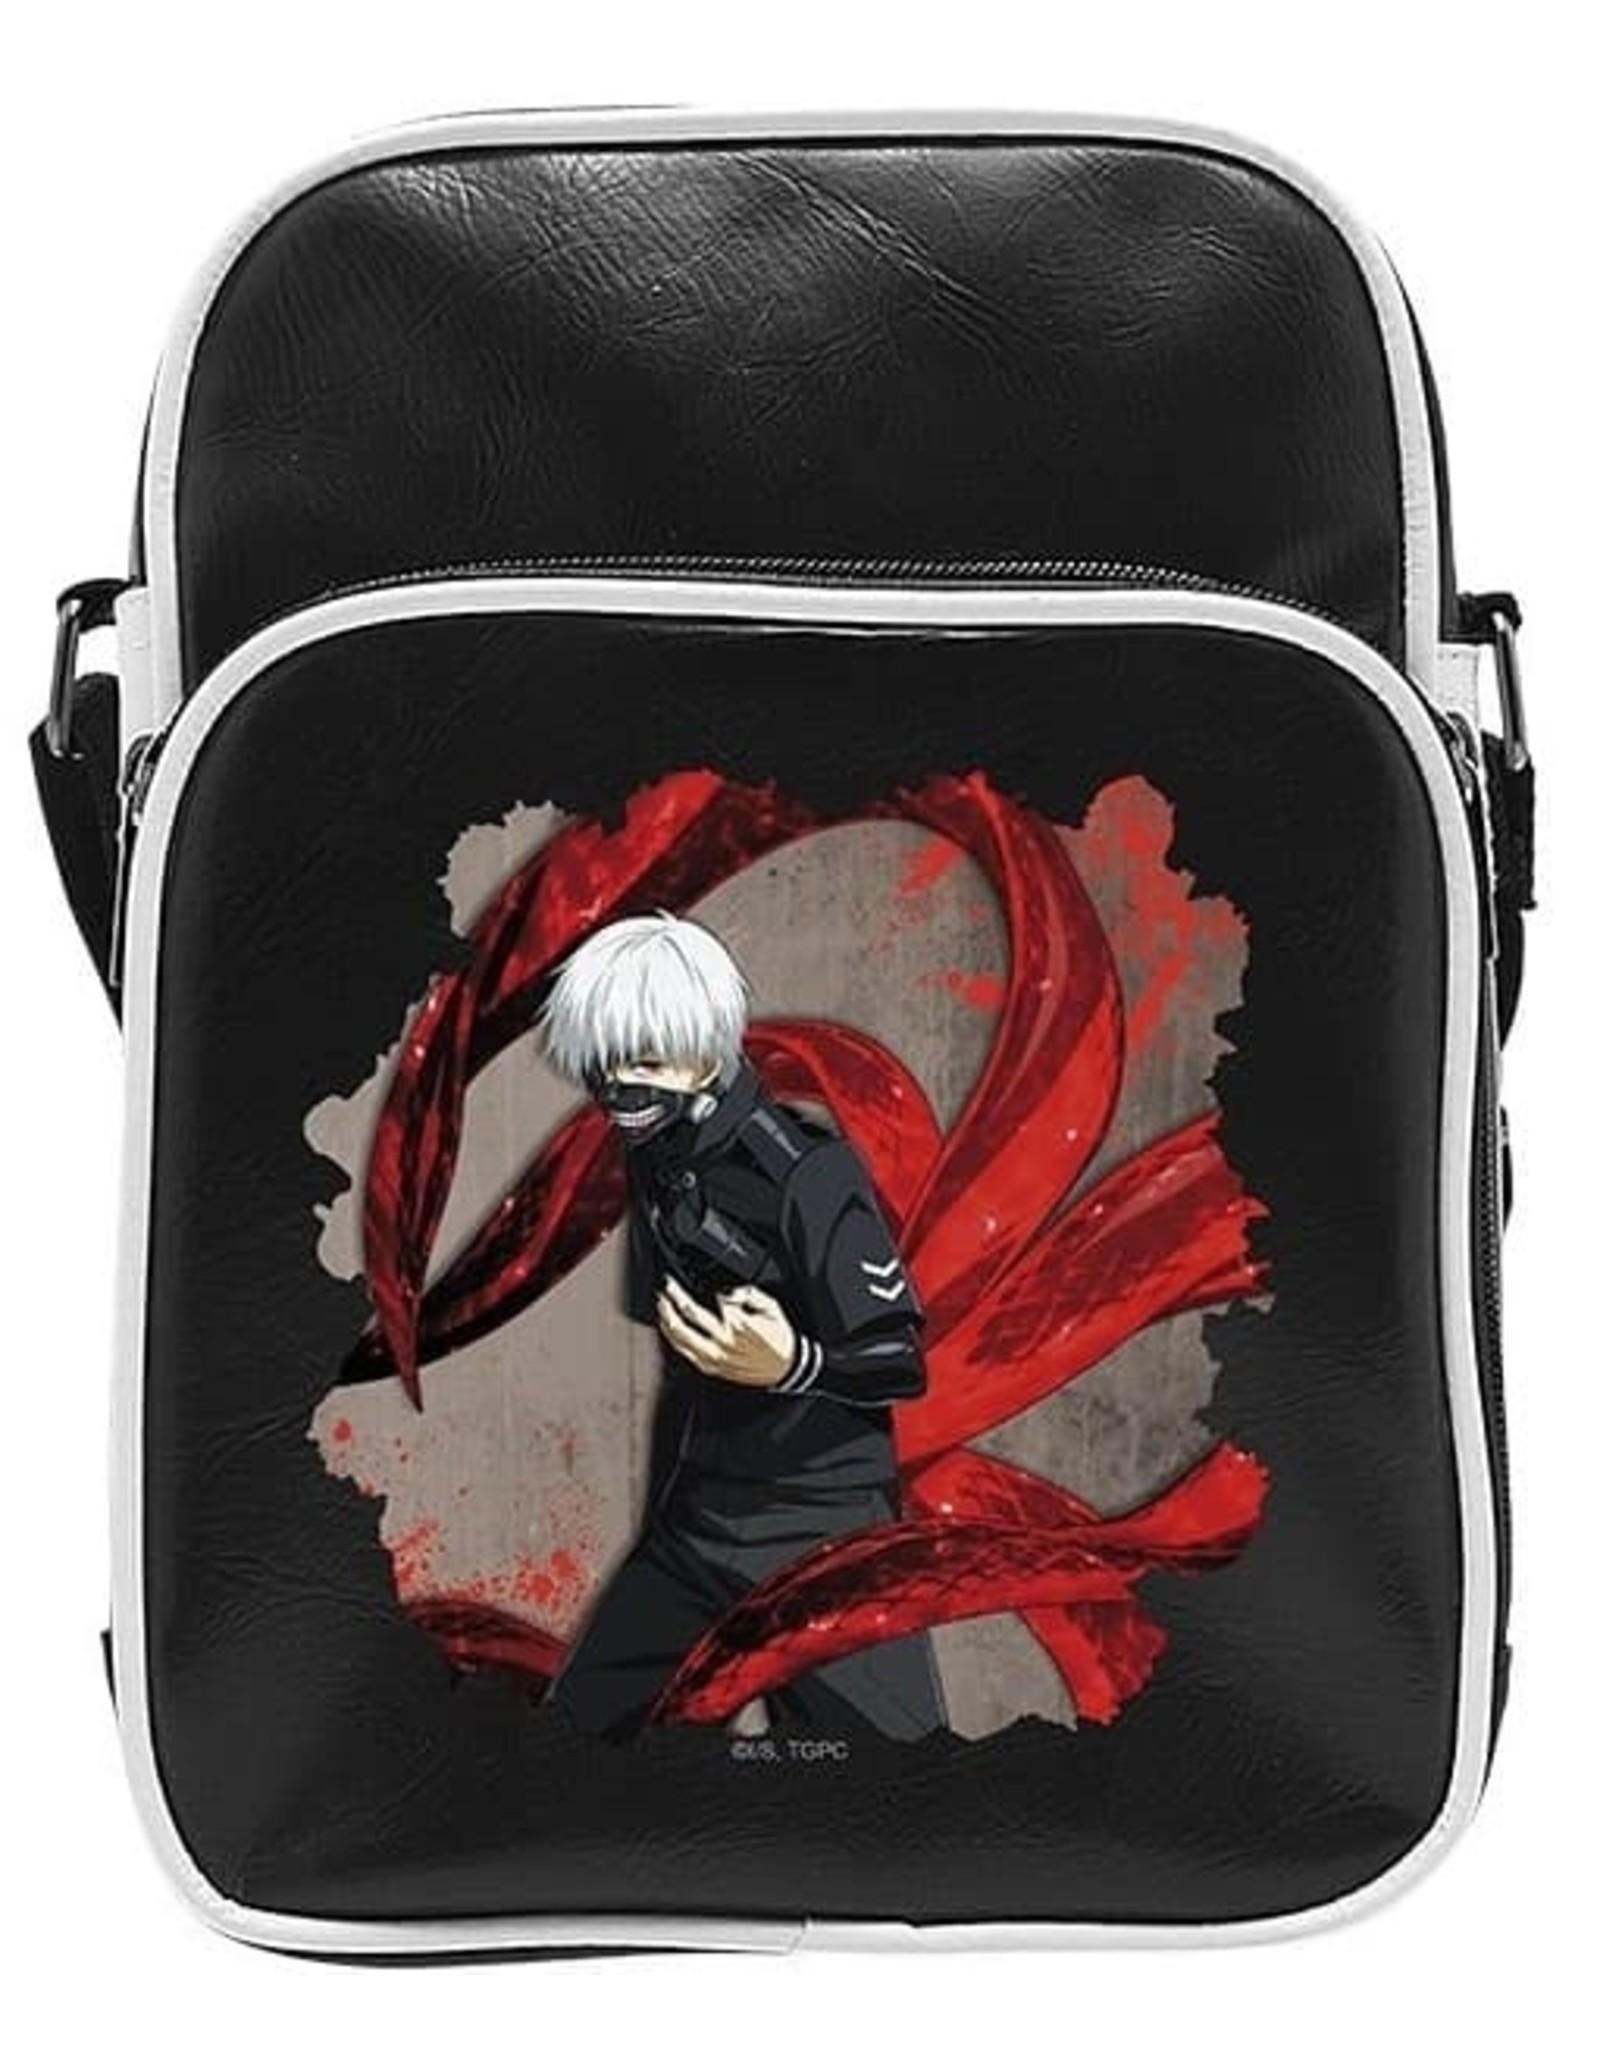 Tokyo Ghoul Merchandise tassen - Tokyo Ghoul Ken Kaneki schoudertas